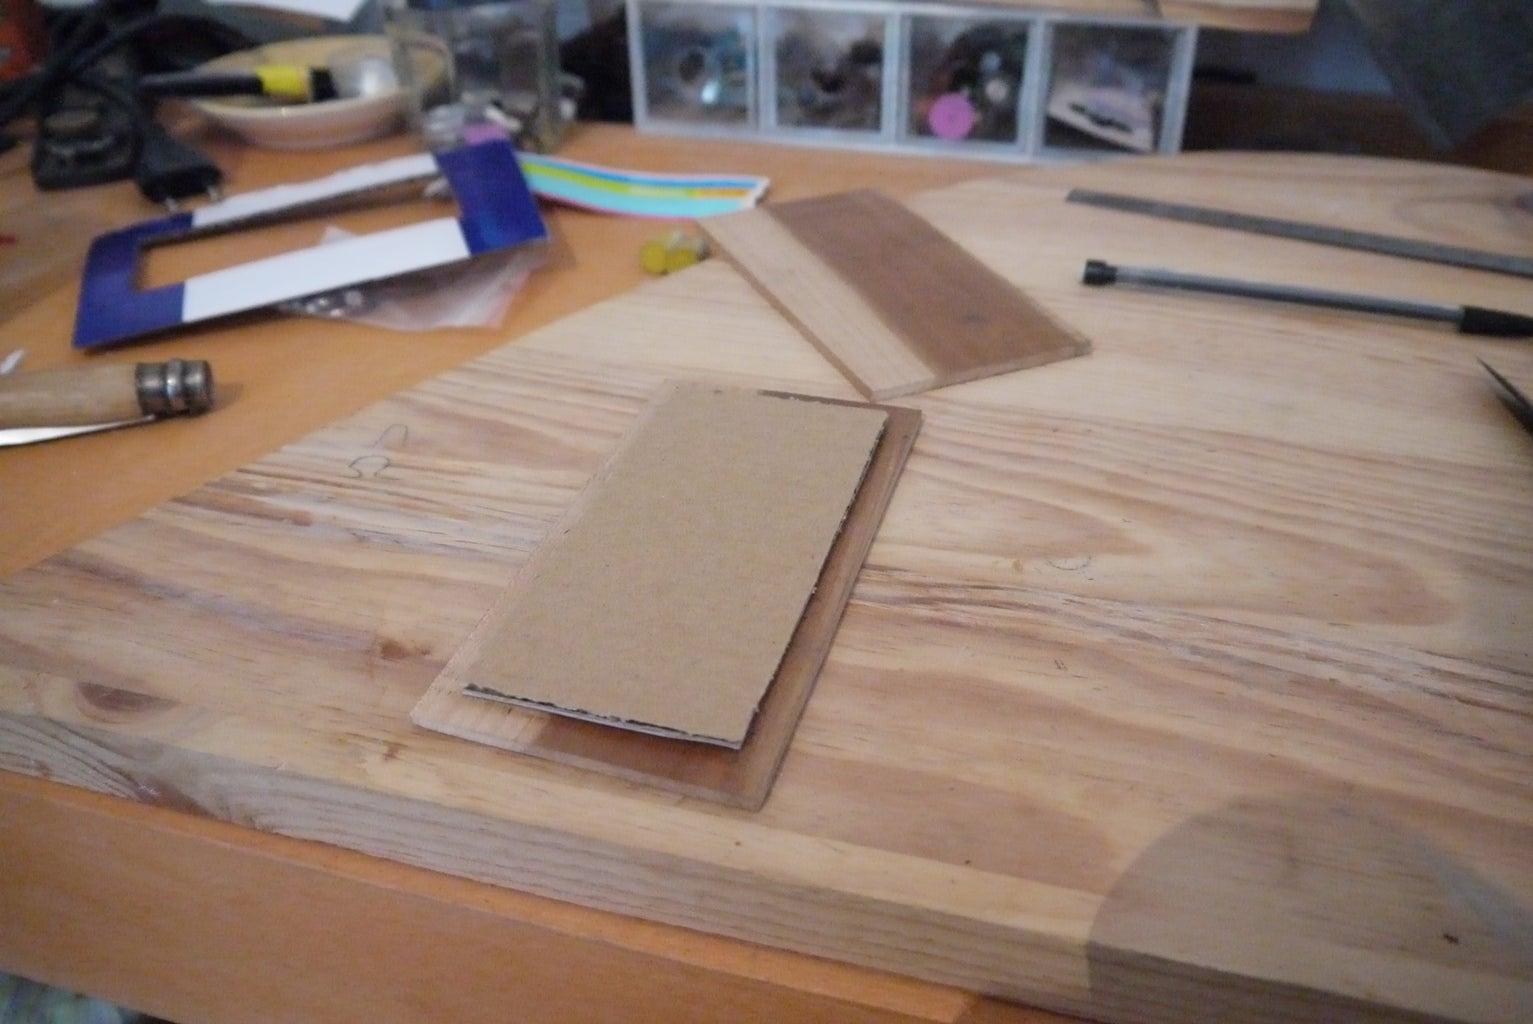 Cut Out the Rough Shape, Glue.